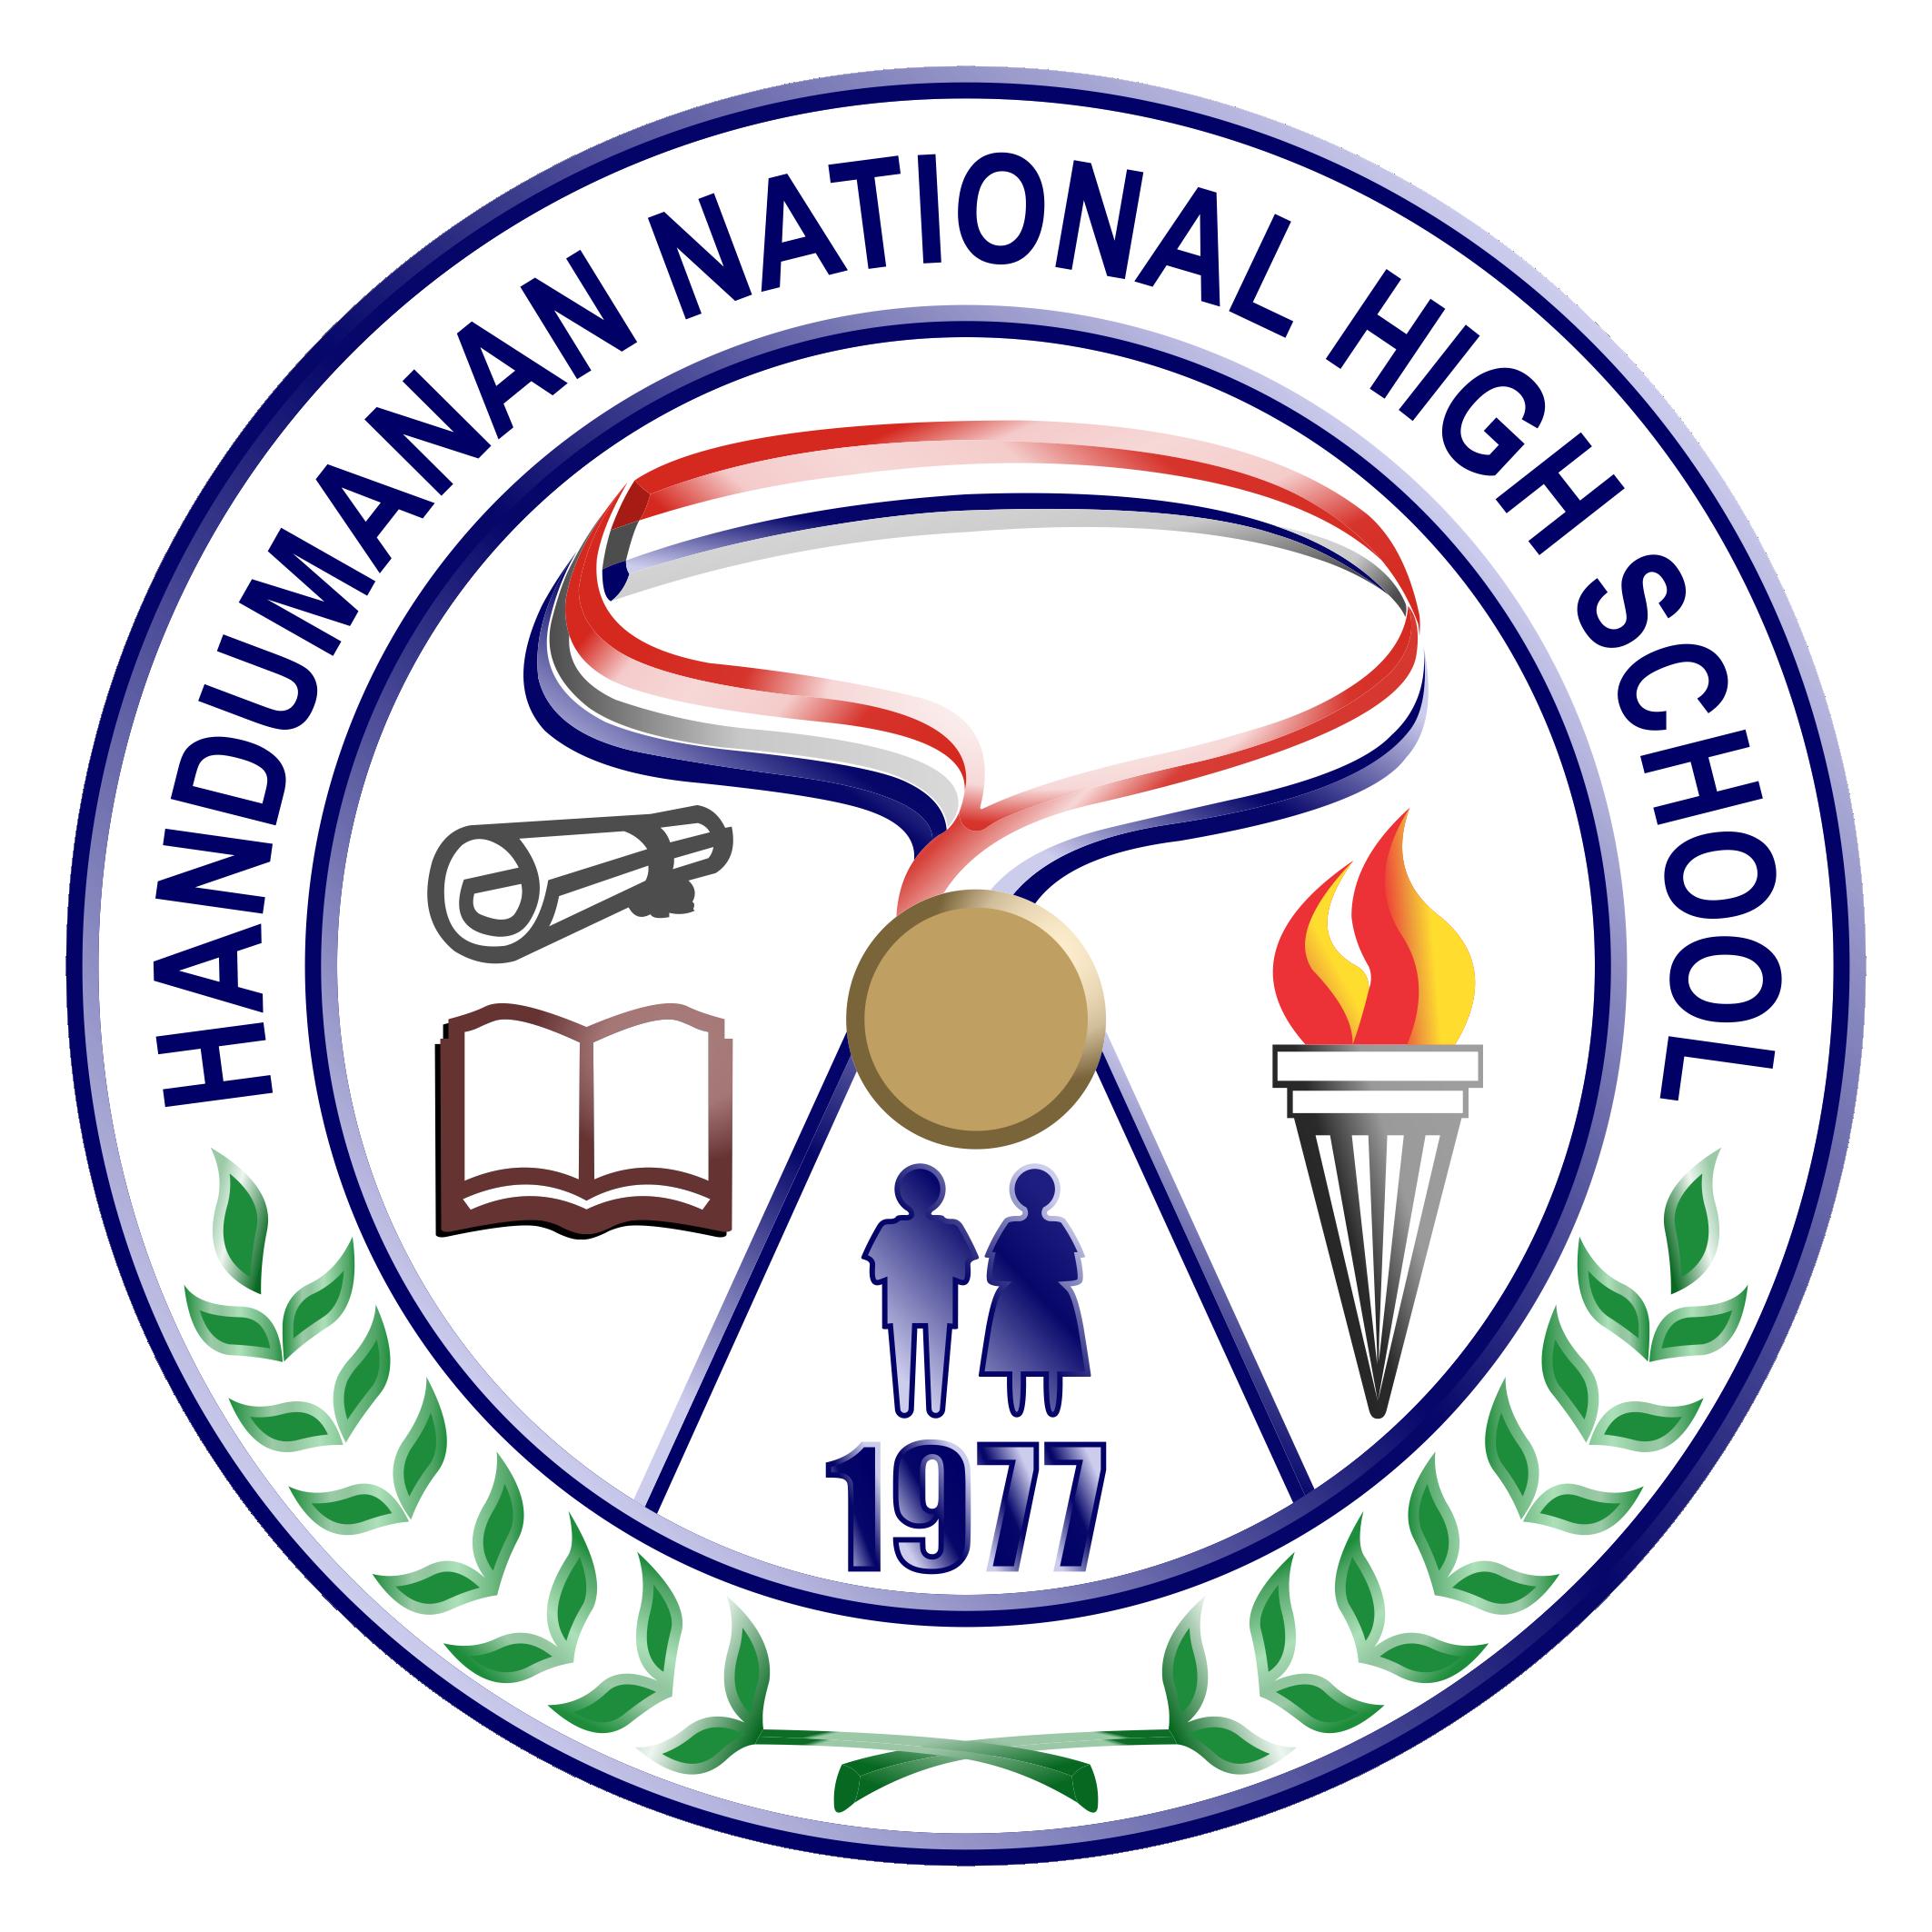 File:Handumanan national High School logo.png.